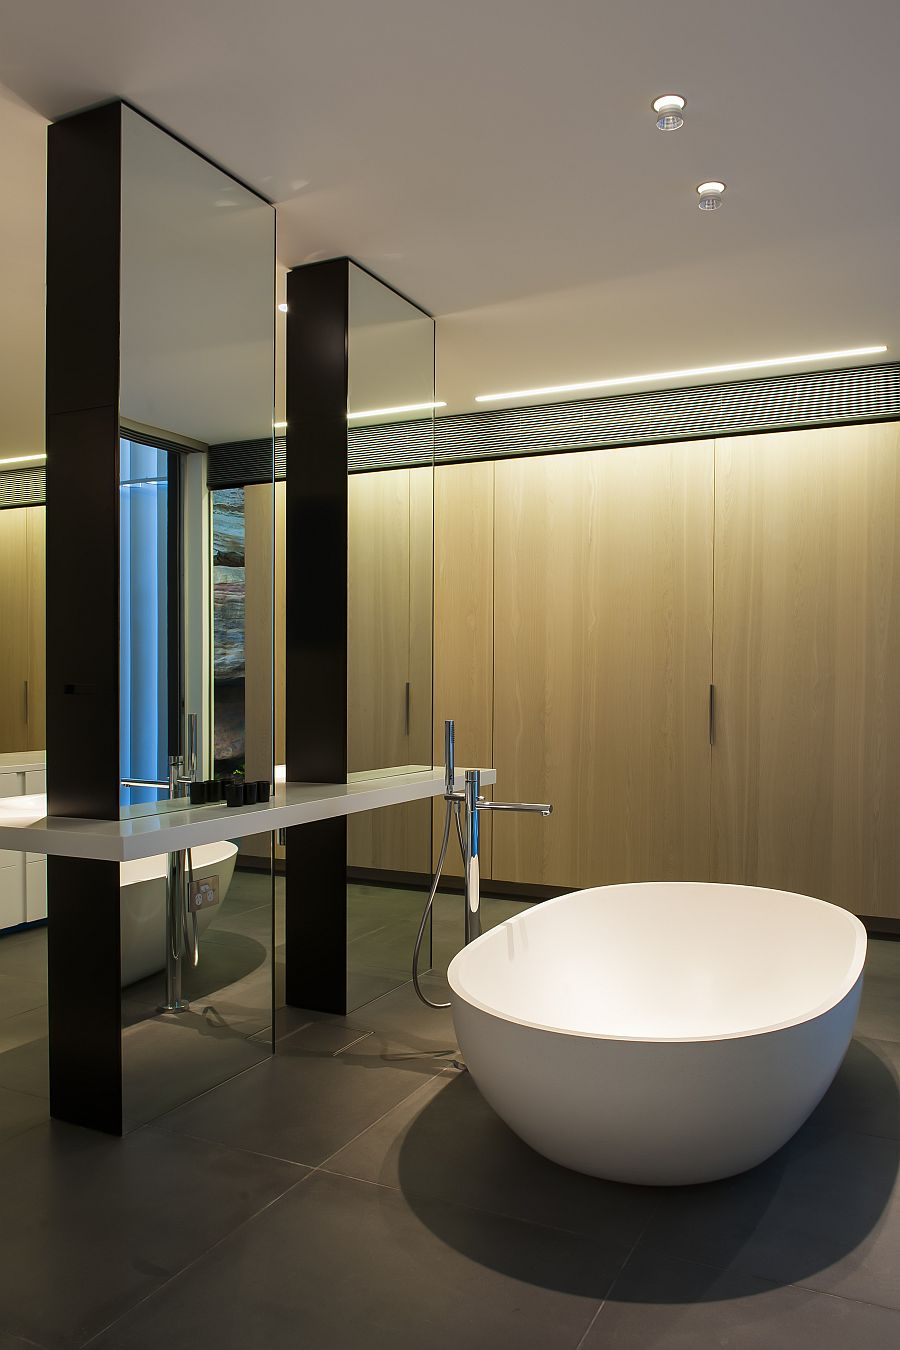 Contemporary Ensuite Bathroom With Cutting Edge Design In